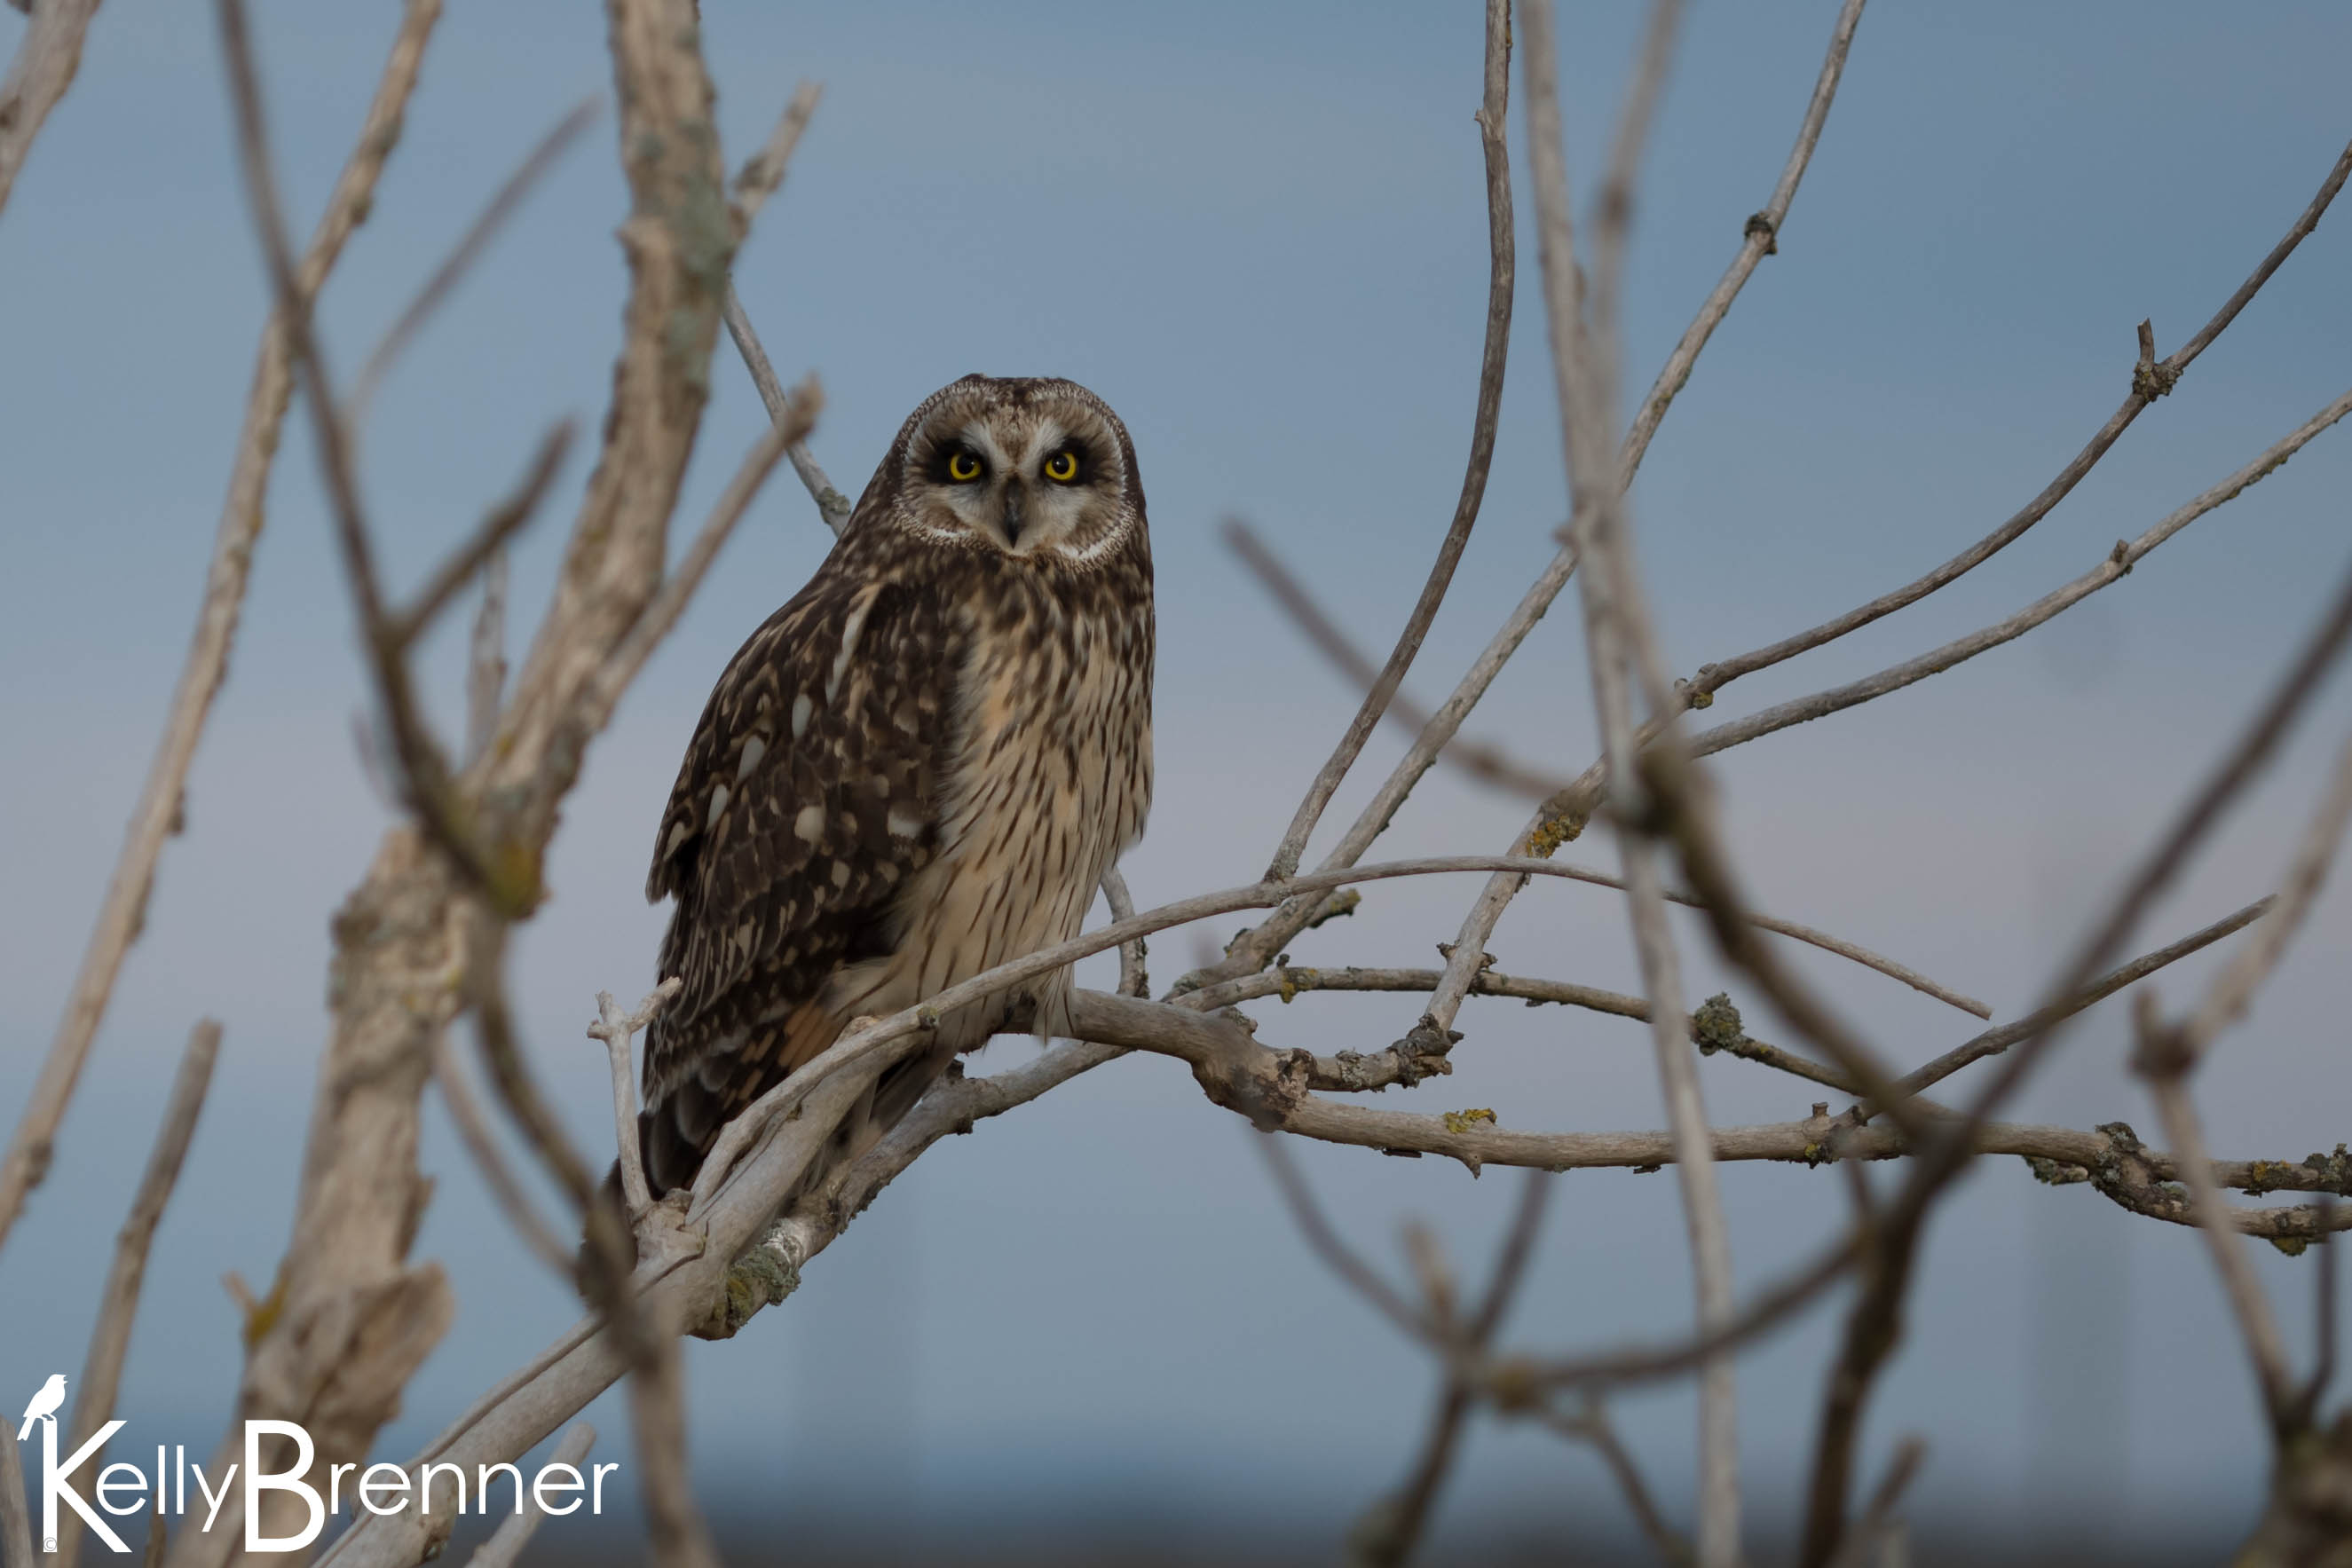 Field Journal: Short-eared Owls